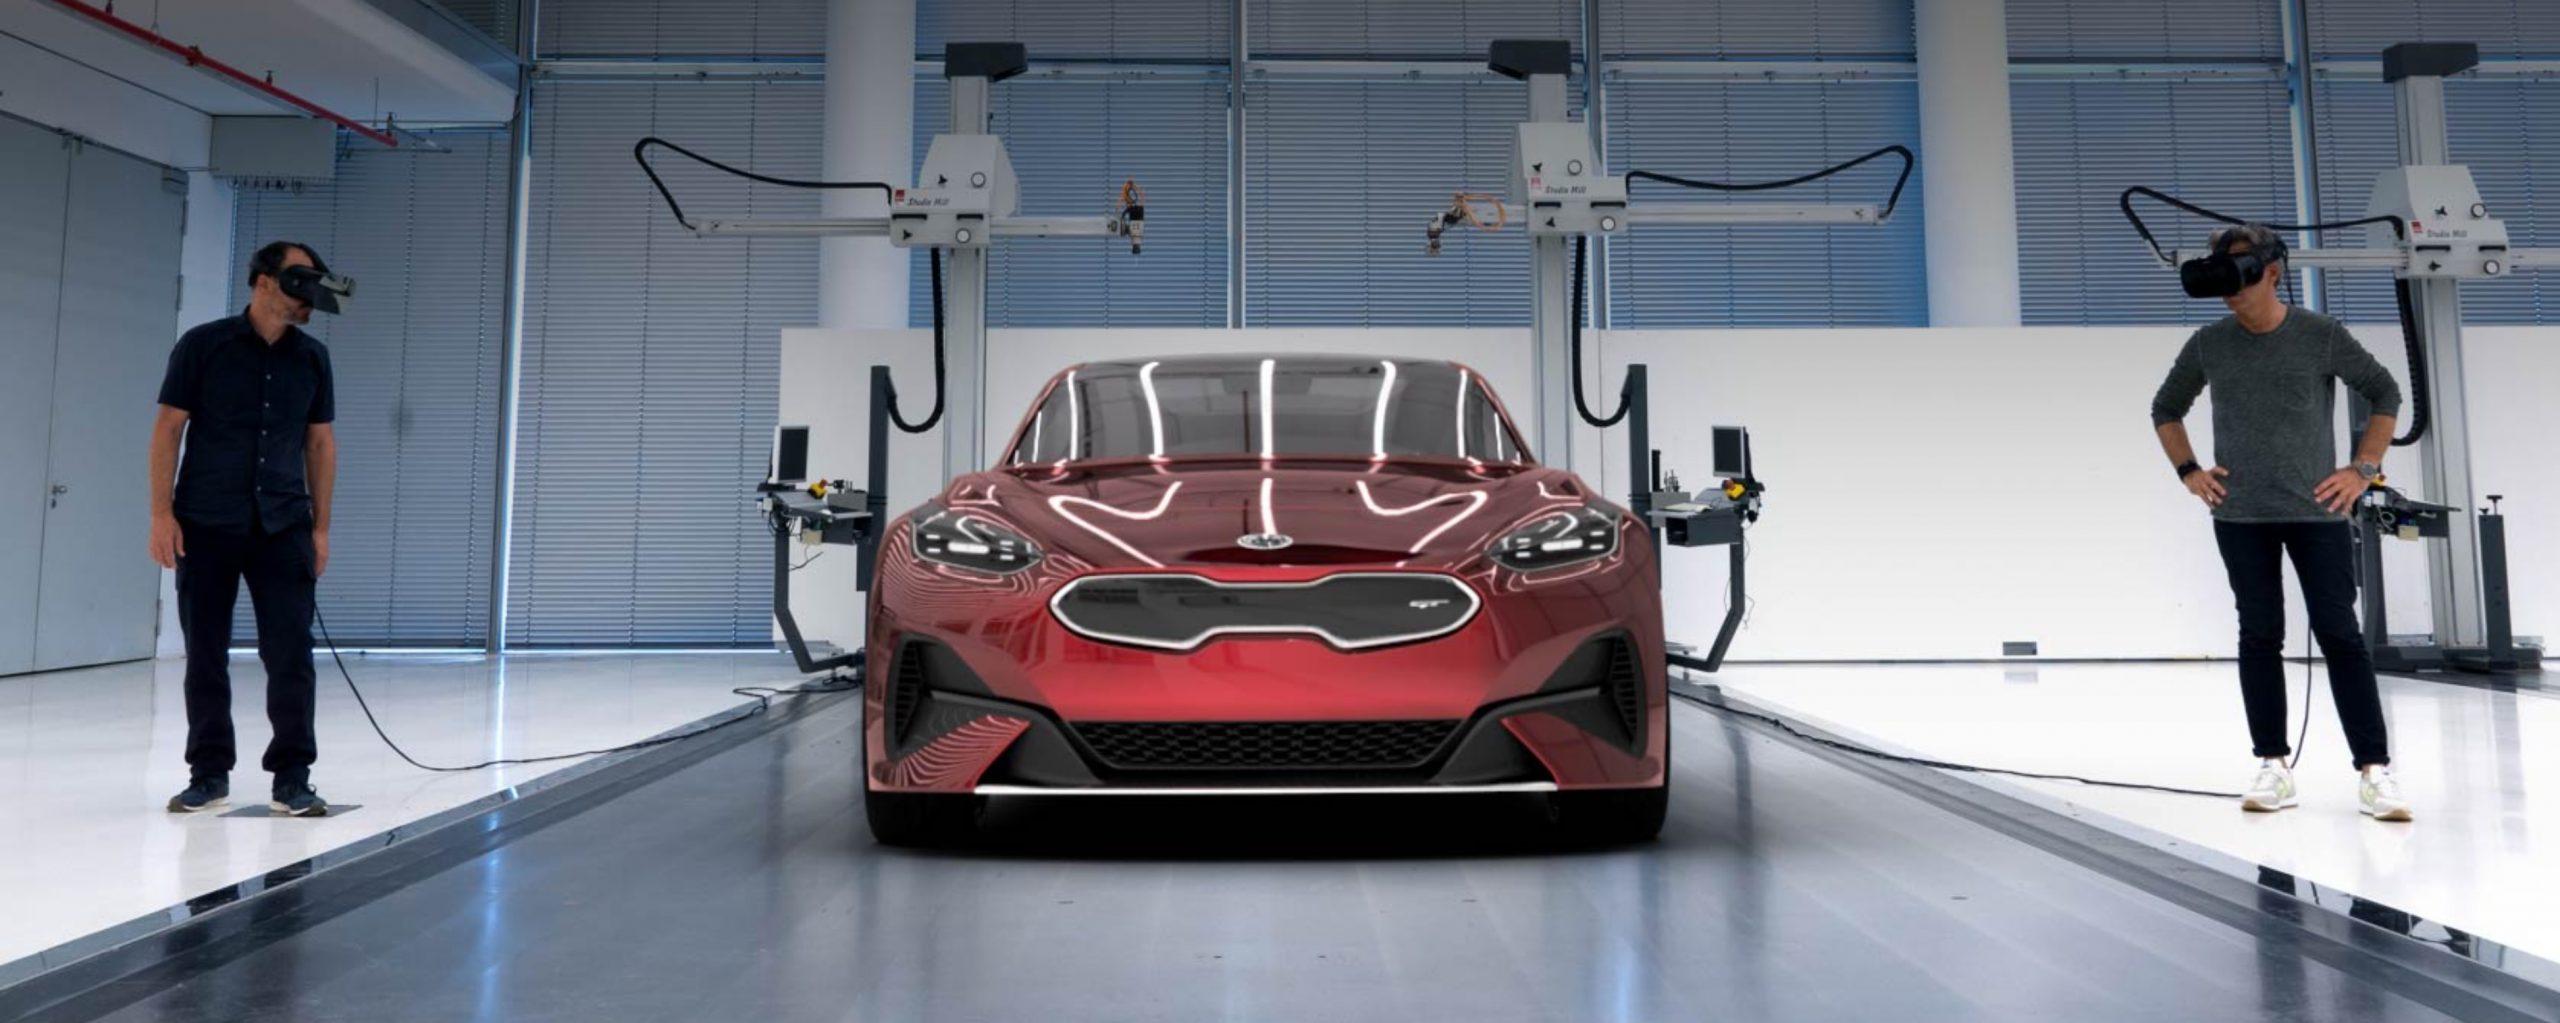 Kia Motor's Car Design XR Collaboration